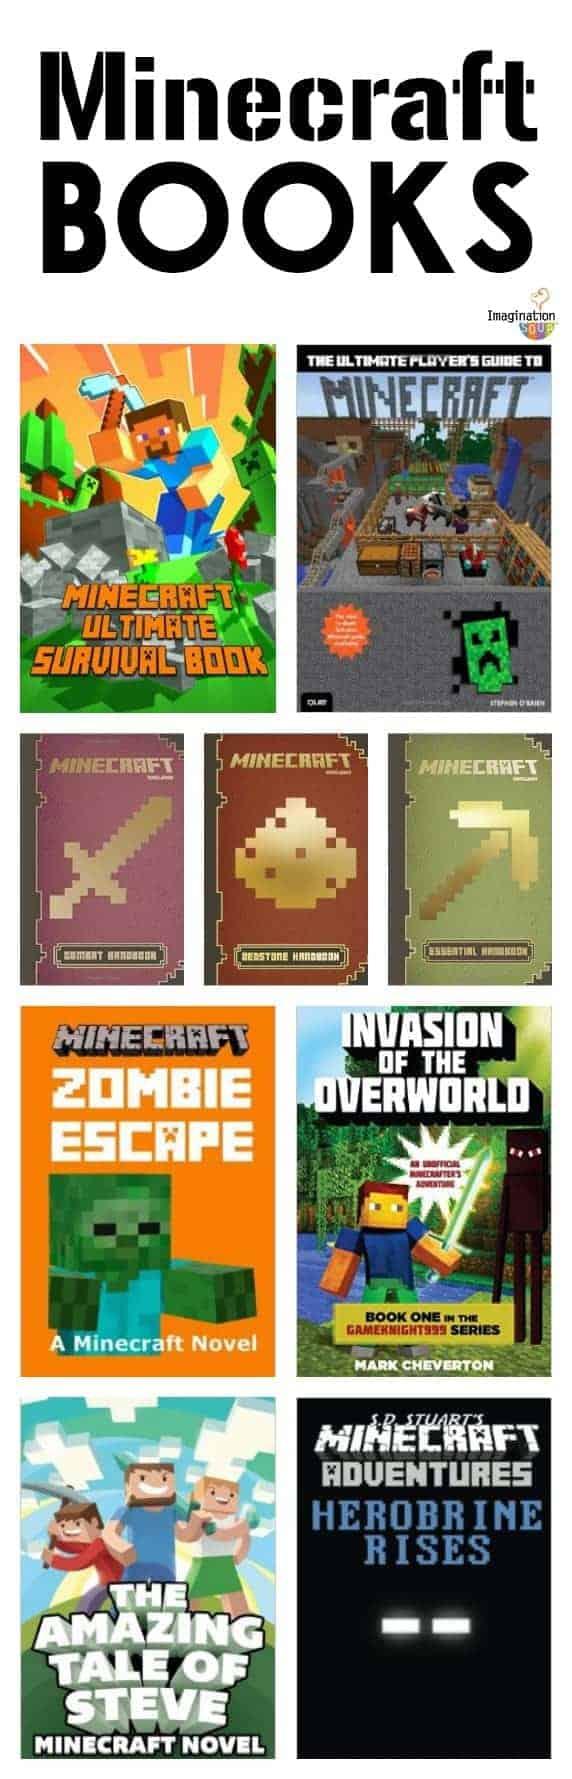 Minecraft Books